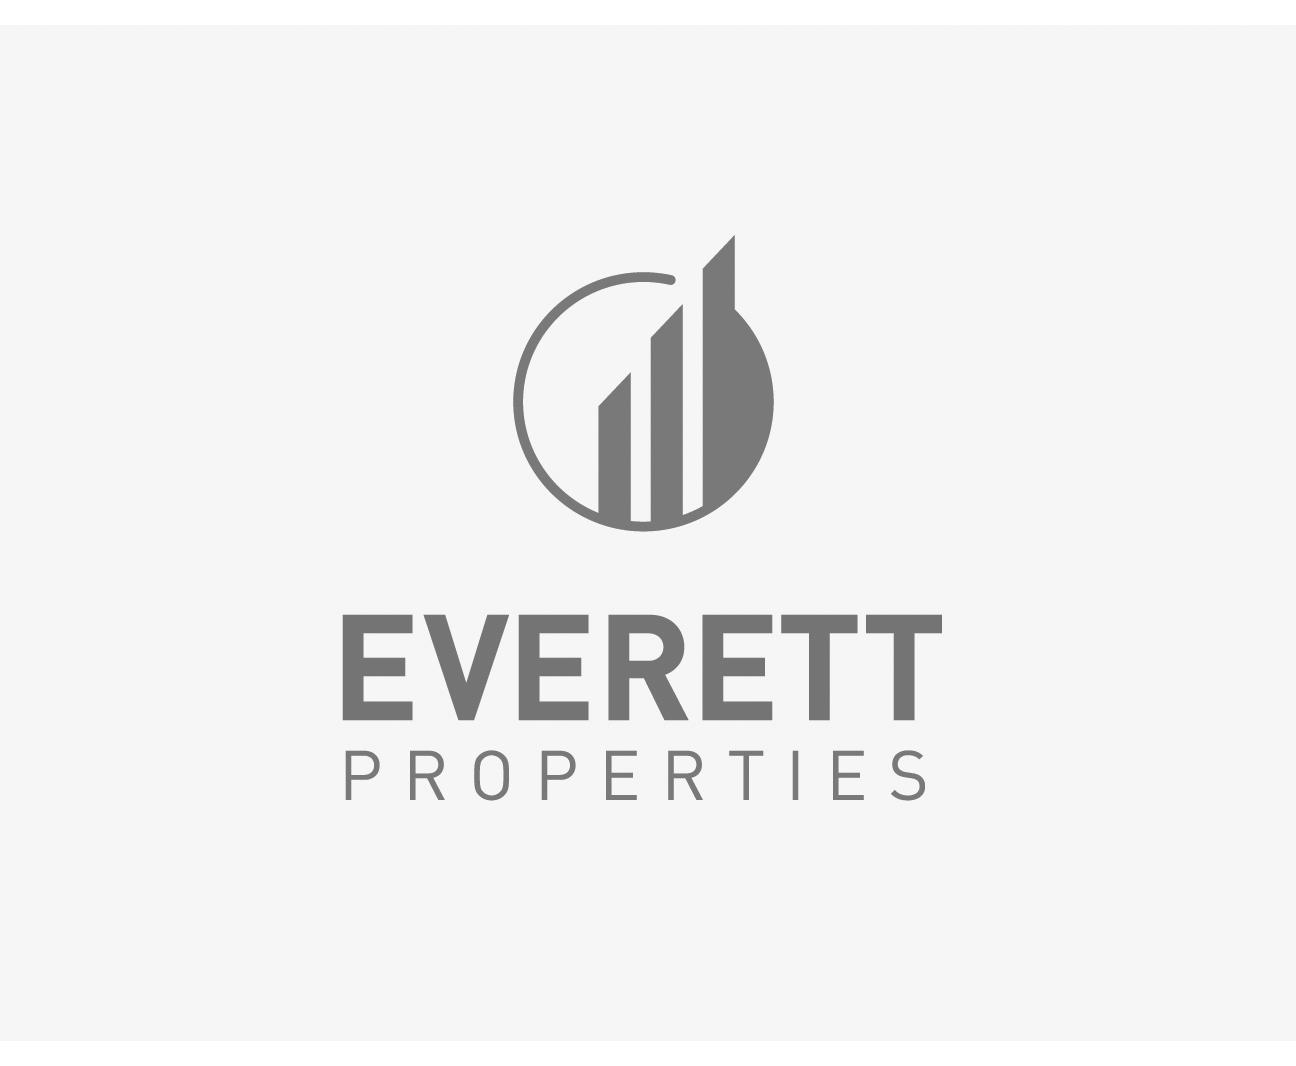 logo_everett_gs.jpg